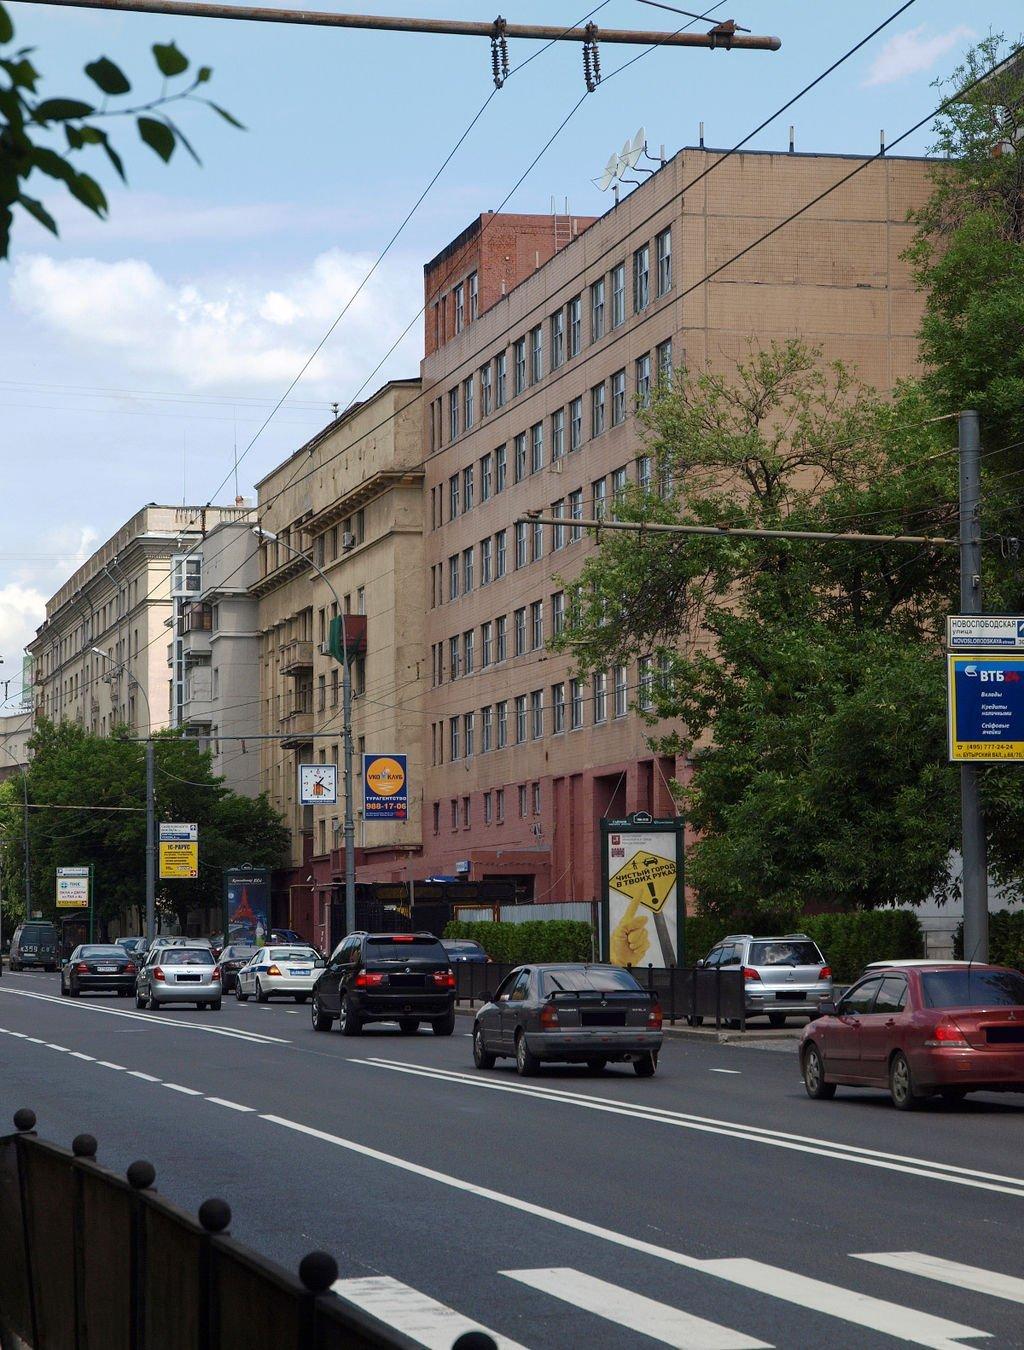 Развитие сайта Улица Бутырский Вал дорвеи на сайт казино Санкт-Петербург